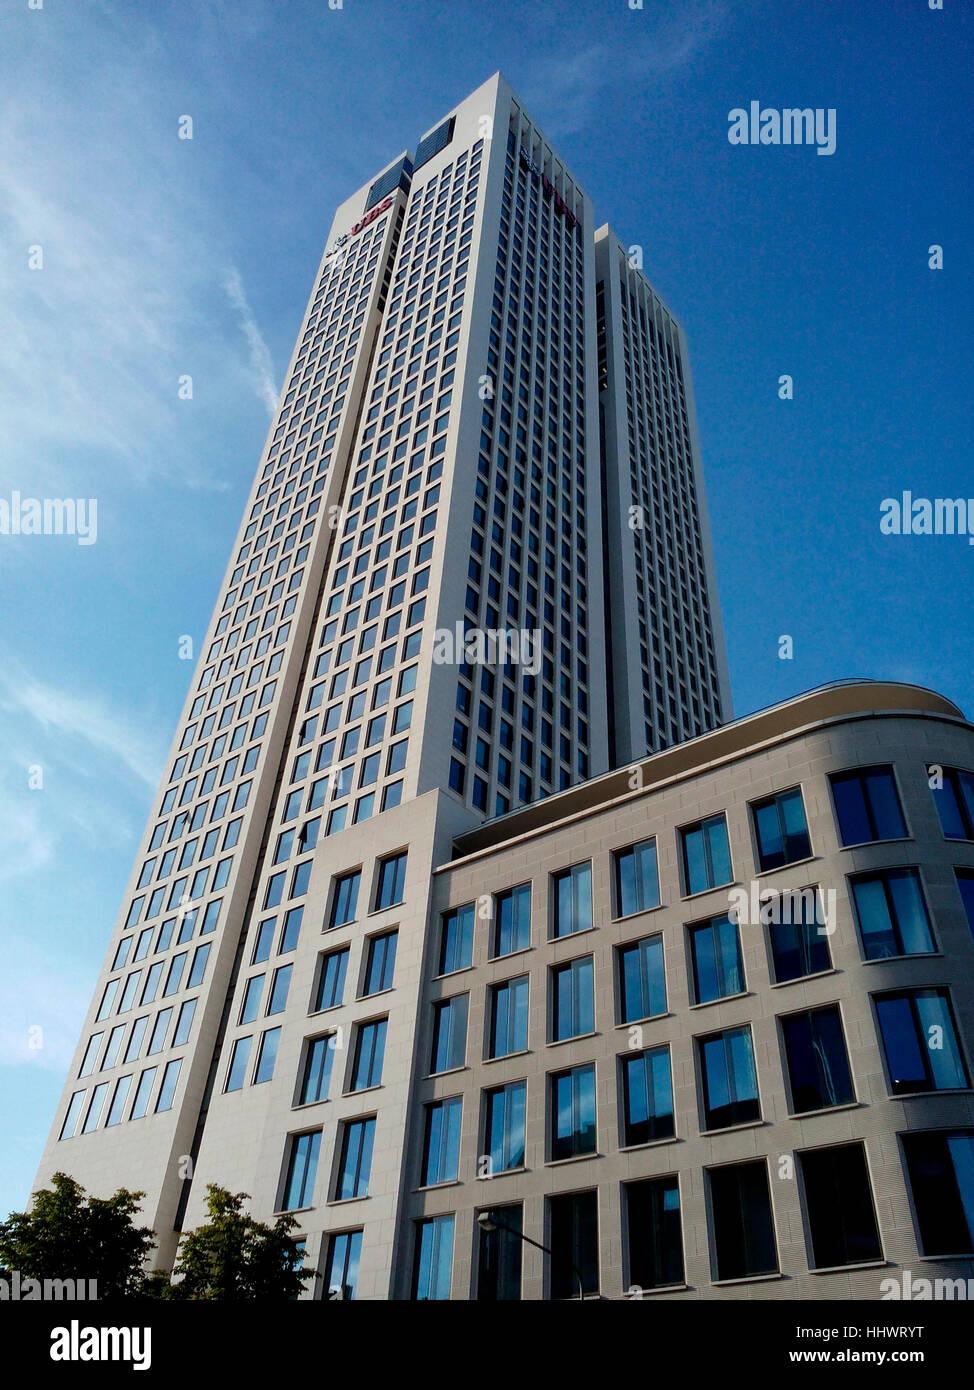 Impressionen: Frankfurt am Main. - Stock Image